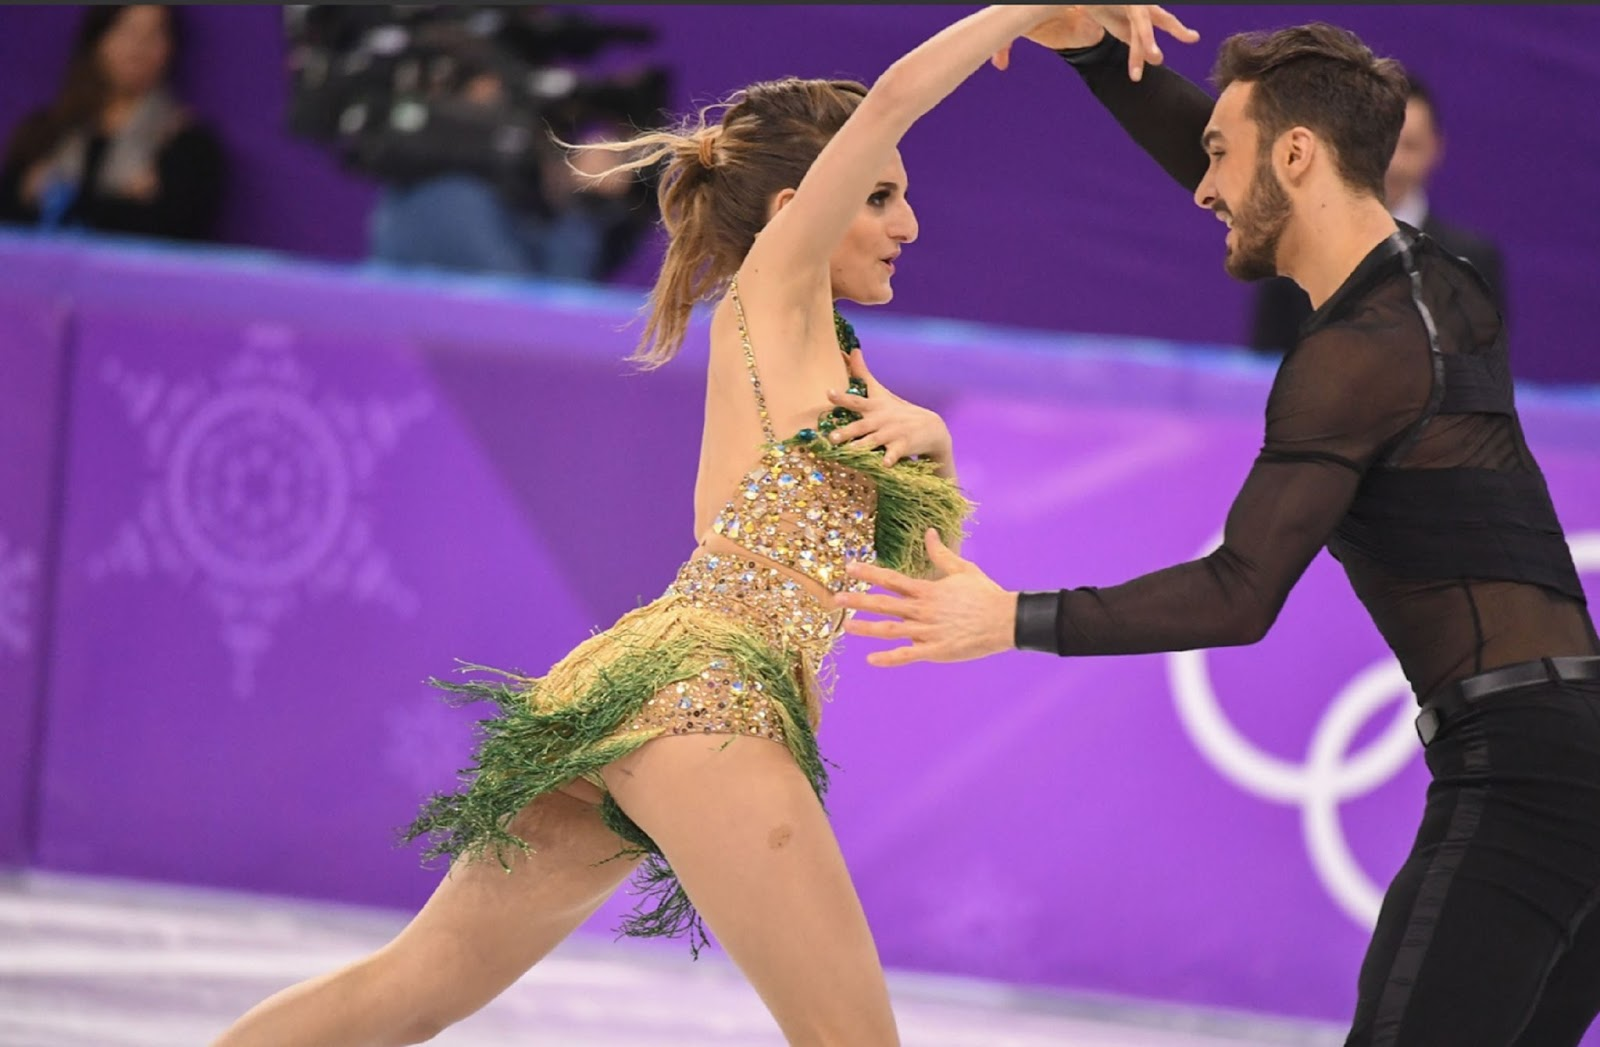 WINTER OLYMPICS : FRANCE'S GABRIELLA PAPADAKIS WARDROBE ...